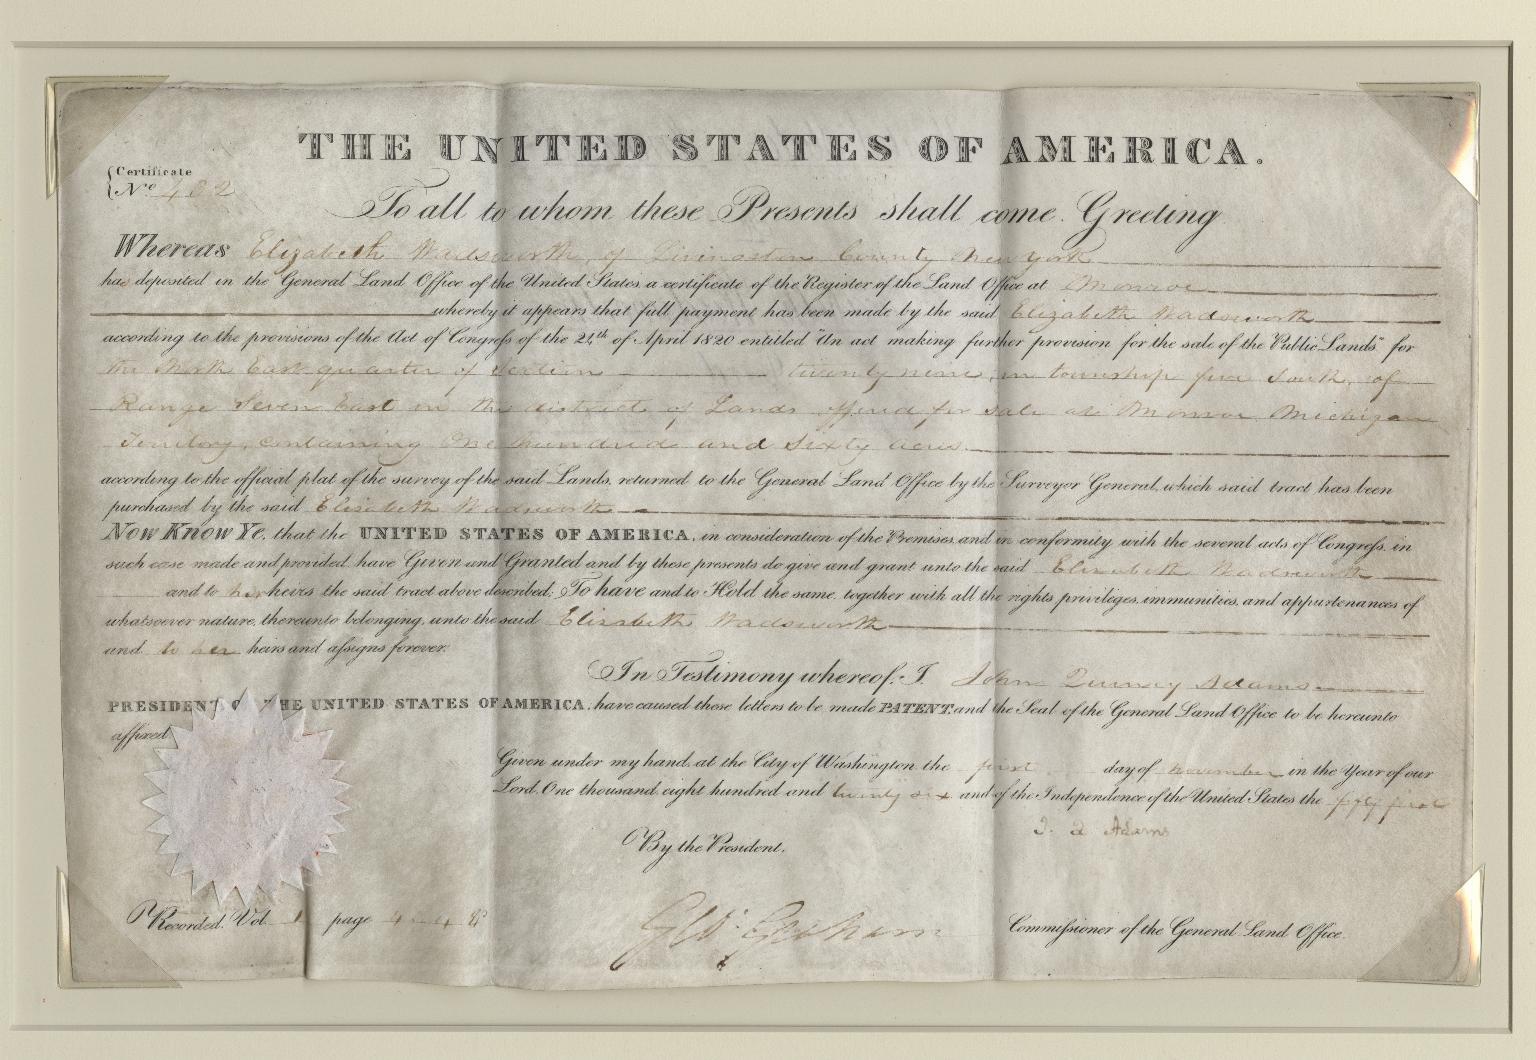 John Quincy Adams signed sale of land